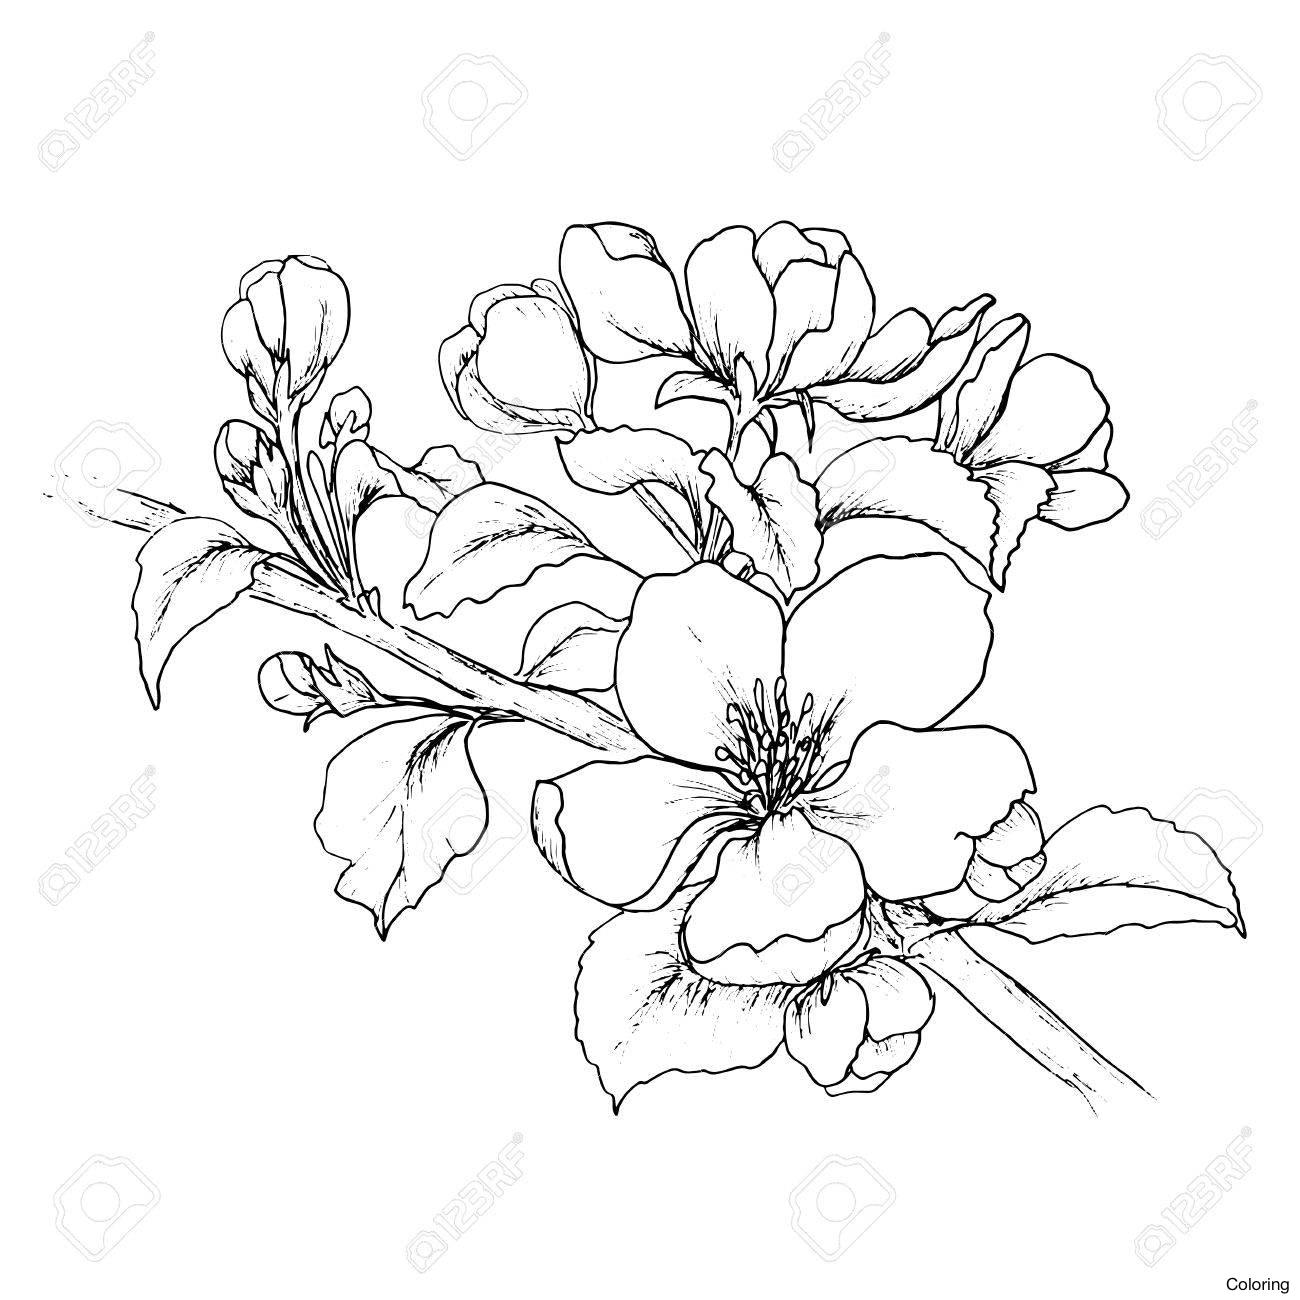 1300x1300 Drawn Sakura Blossom Japenese 7 Cherry Drawings Coloring Pin 15 2f